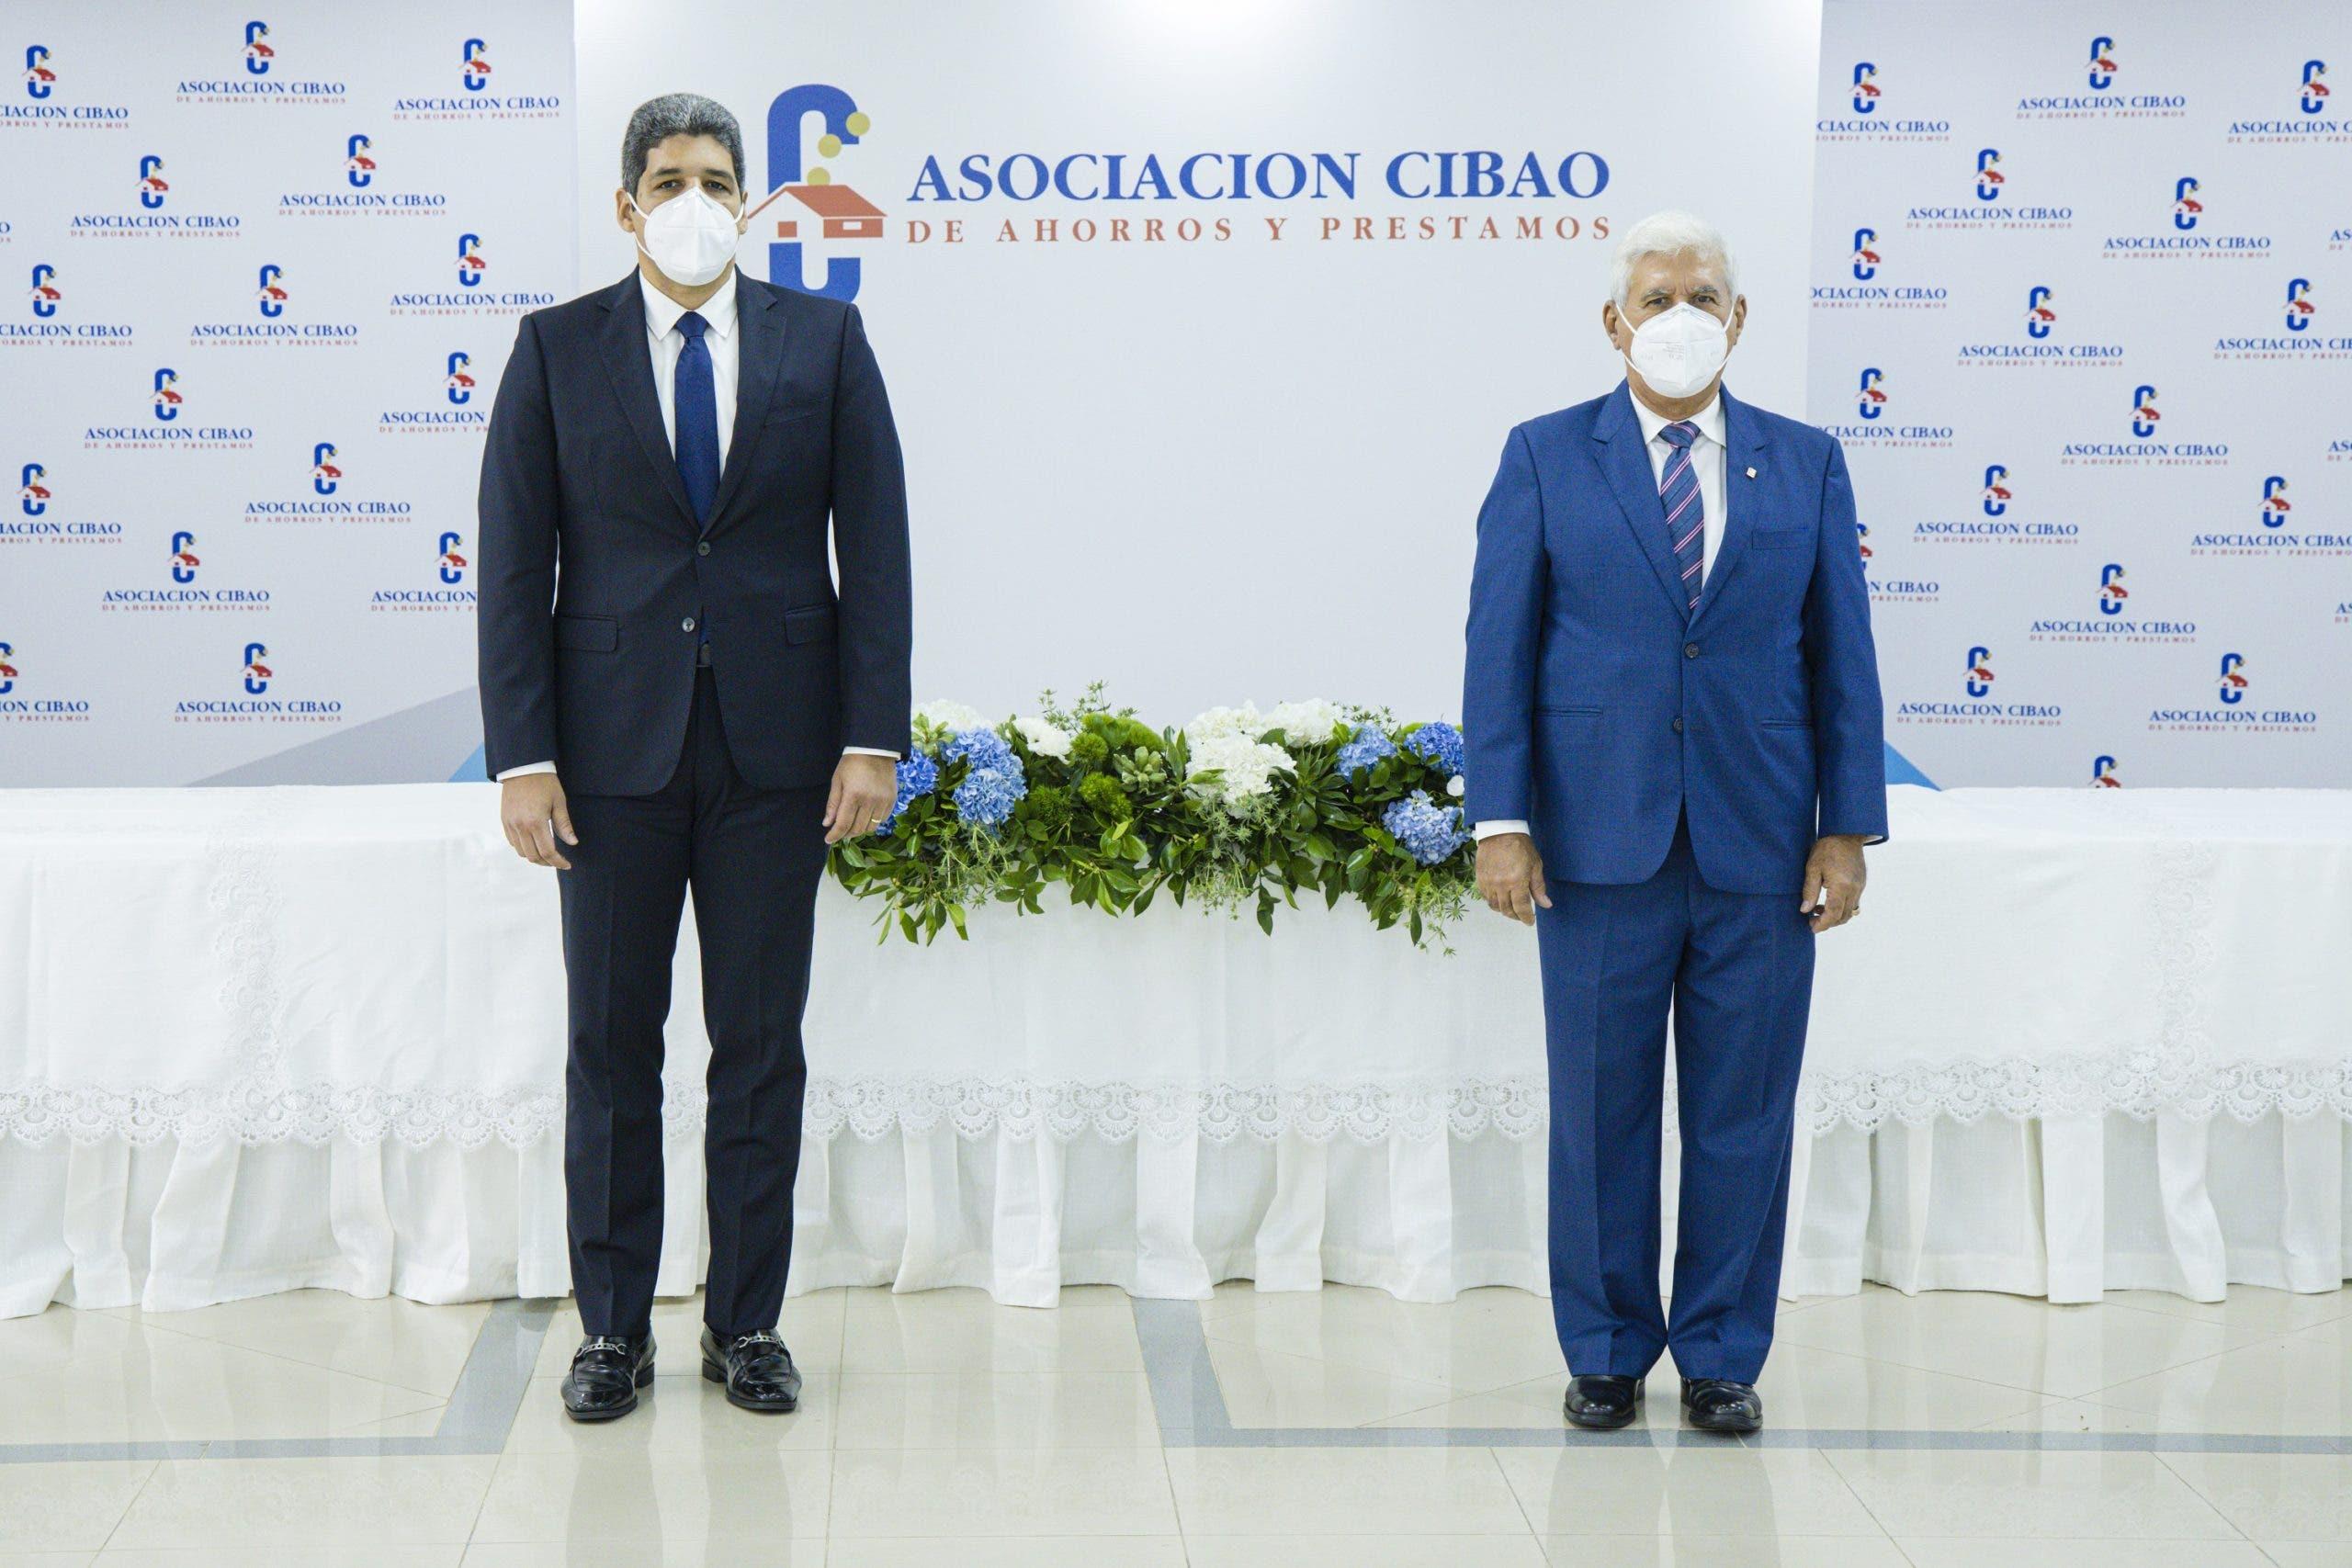 Asociación Cibao designa a nuevos  presidente y vicepresidente